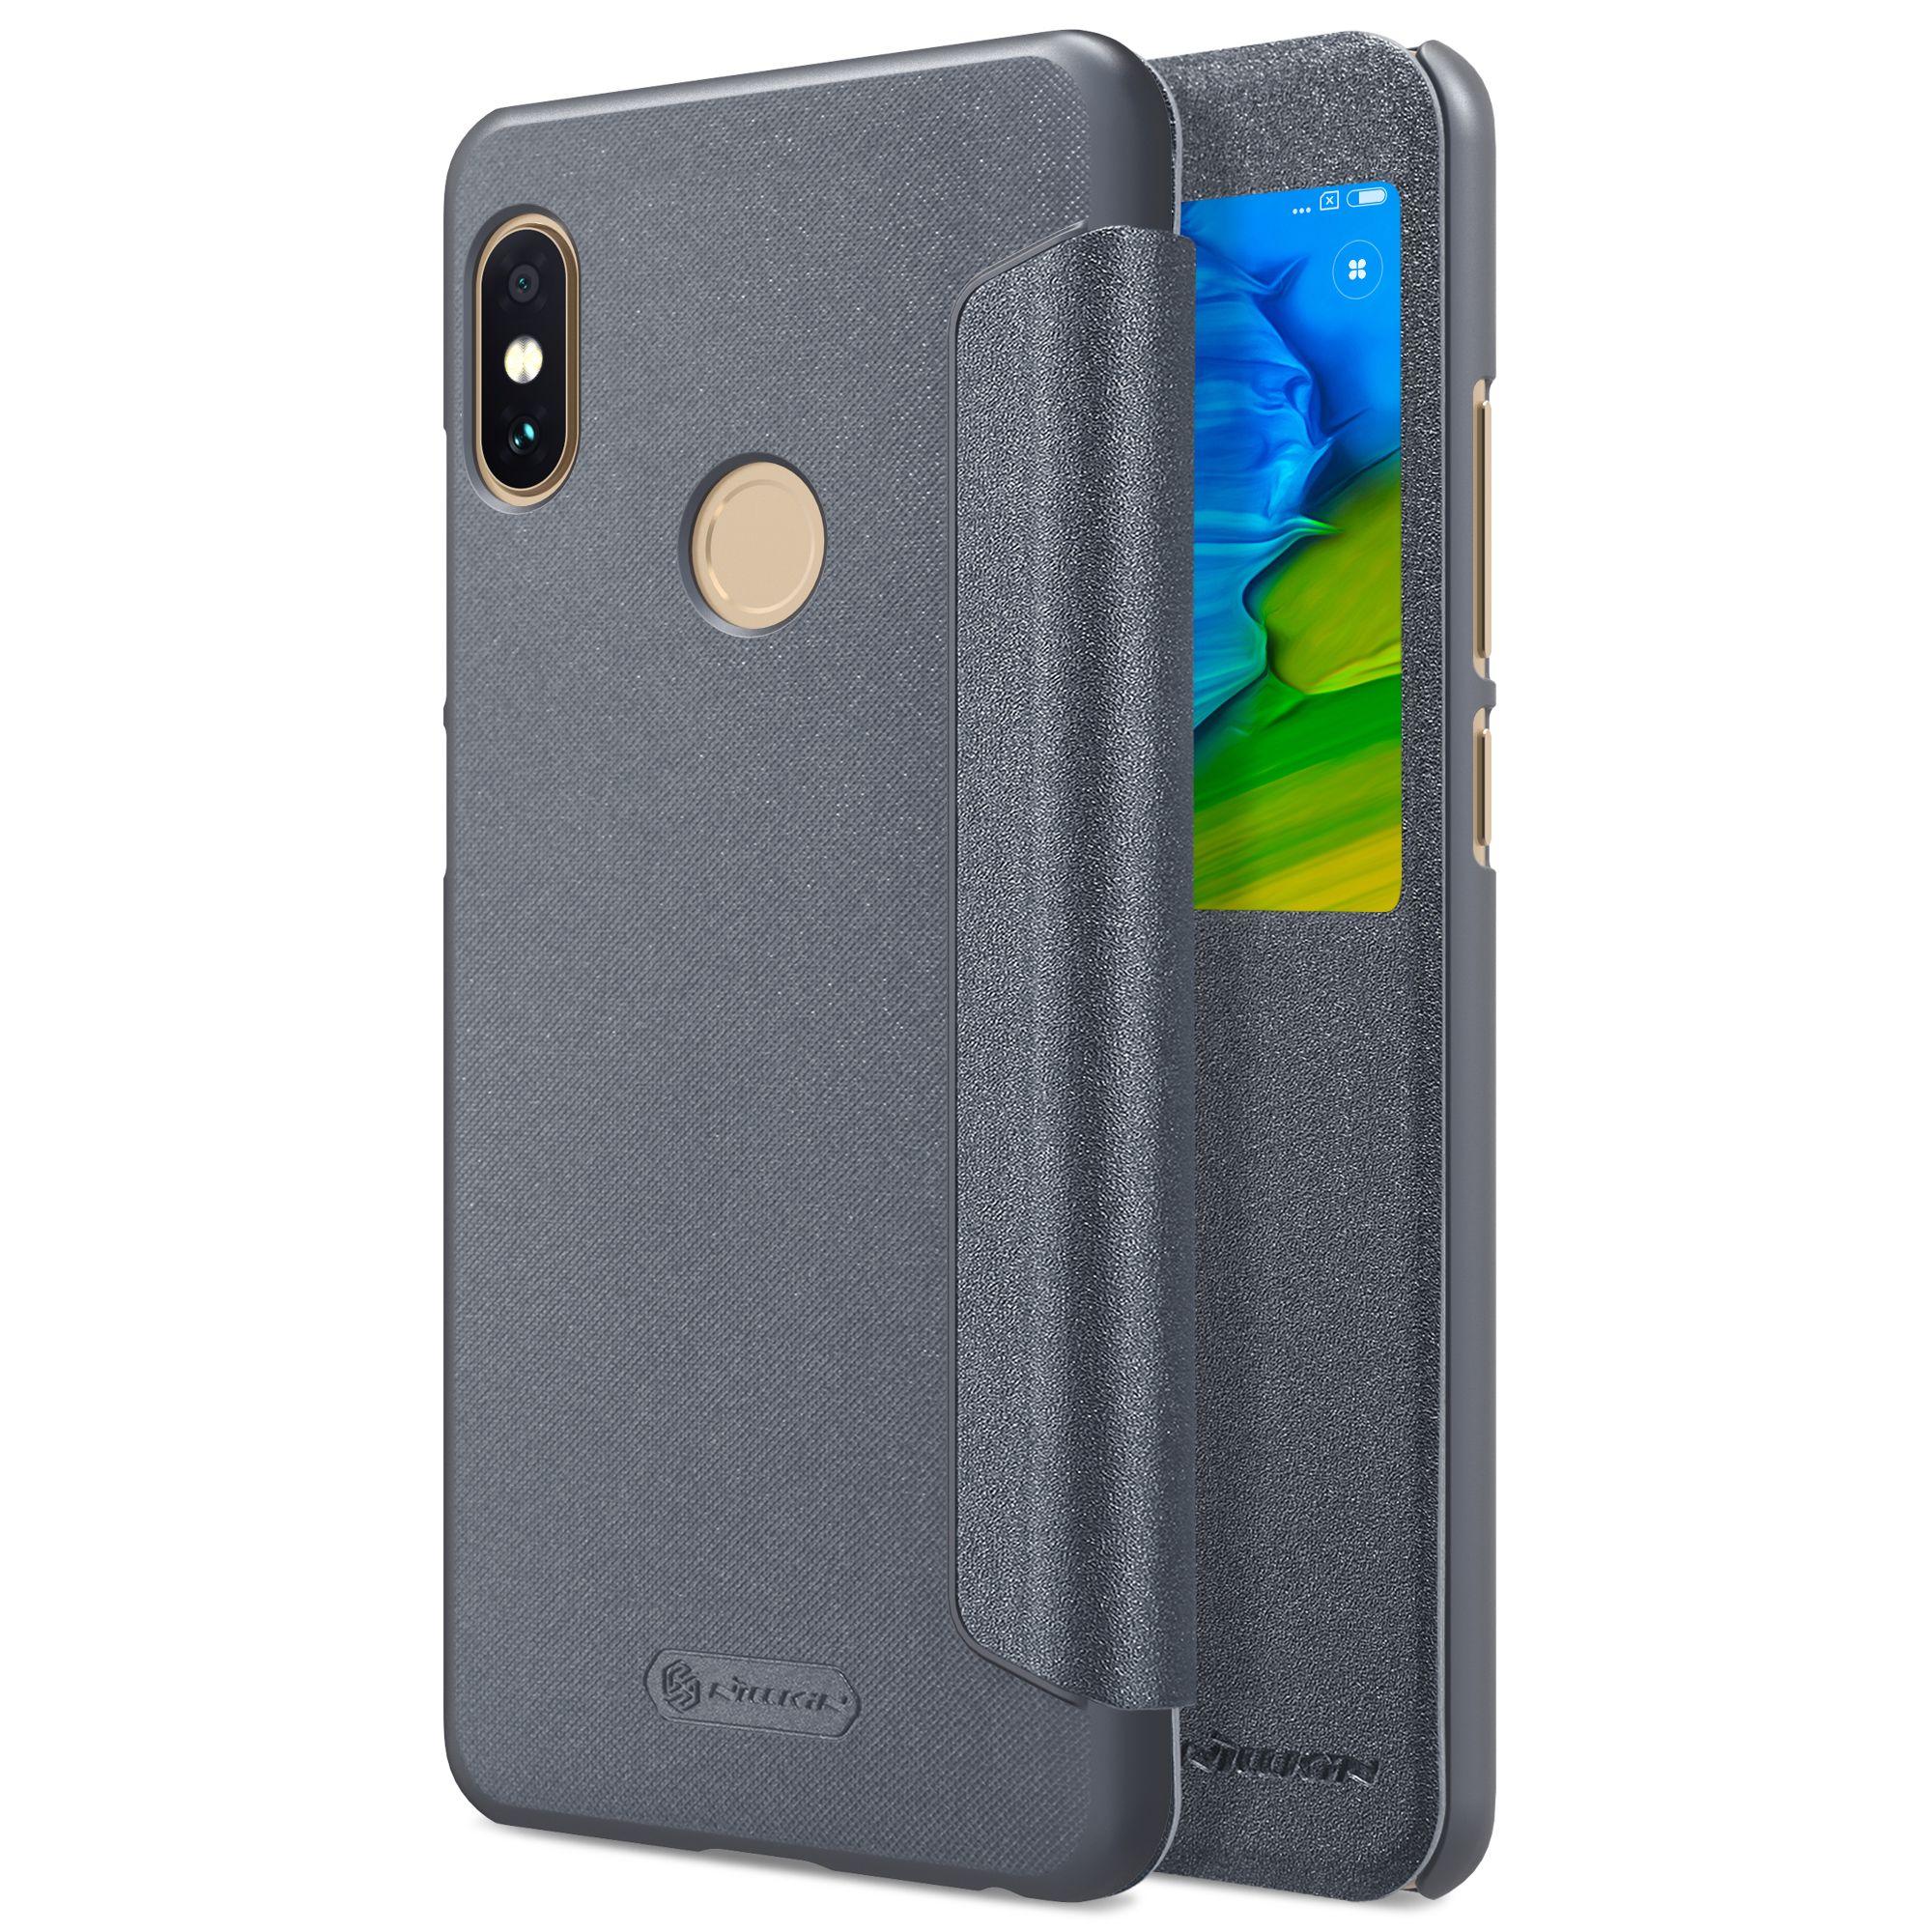 Htc Handy Hüllen Xiaomi Redmi Hinweis 5 Pro Fall Globale Version Redmi Note 5 Fall Nillkin Sparkle Serie Hartplastik Pu Leder Flip Cover Htc e Hülle Von